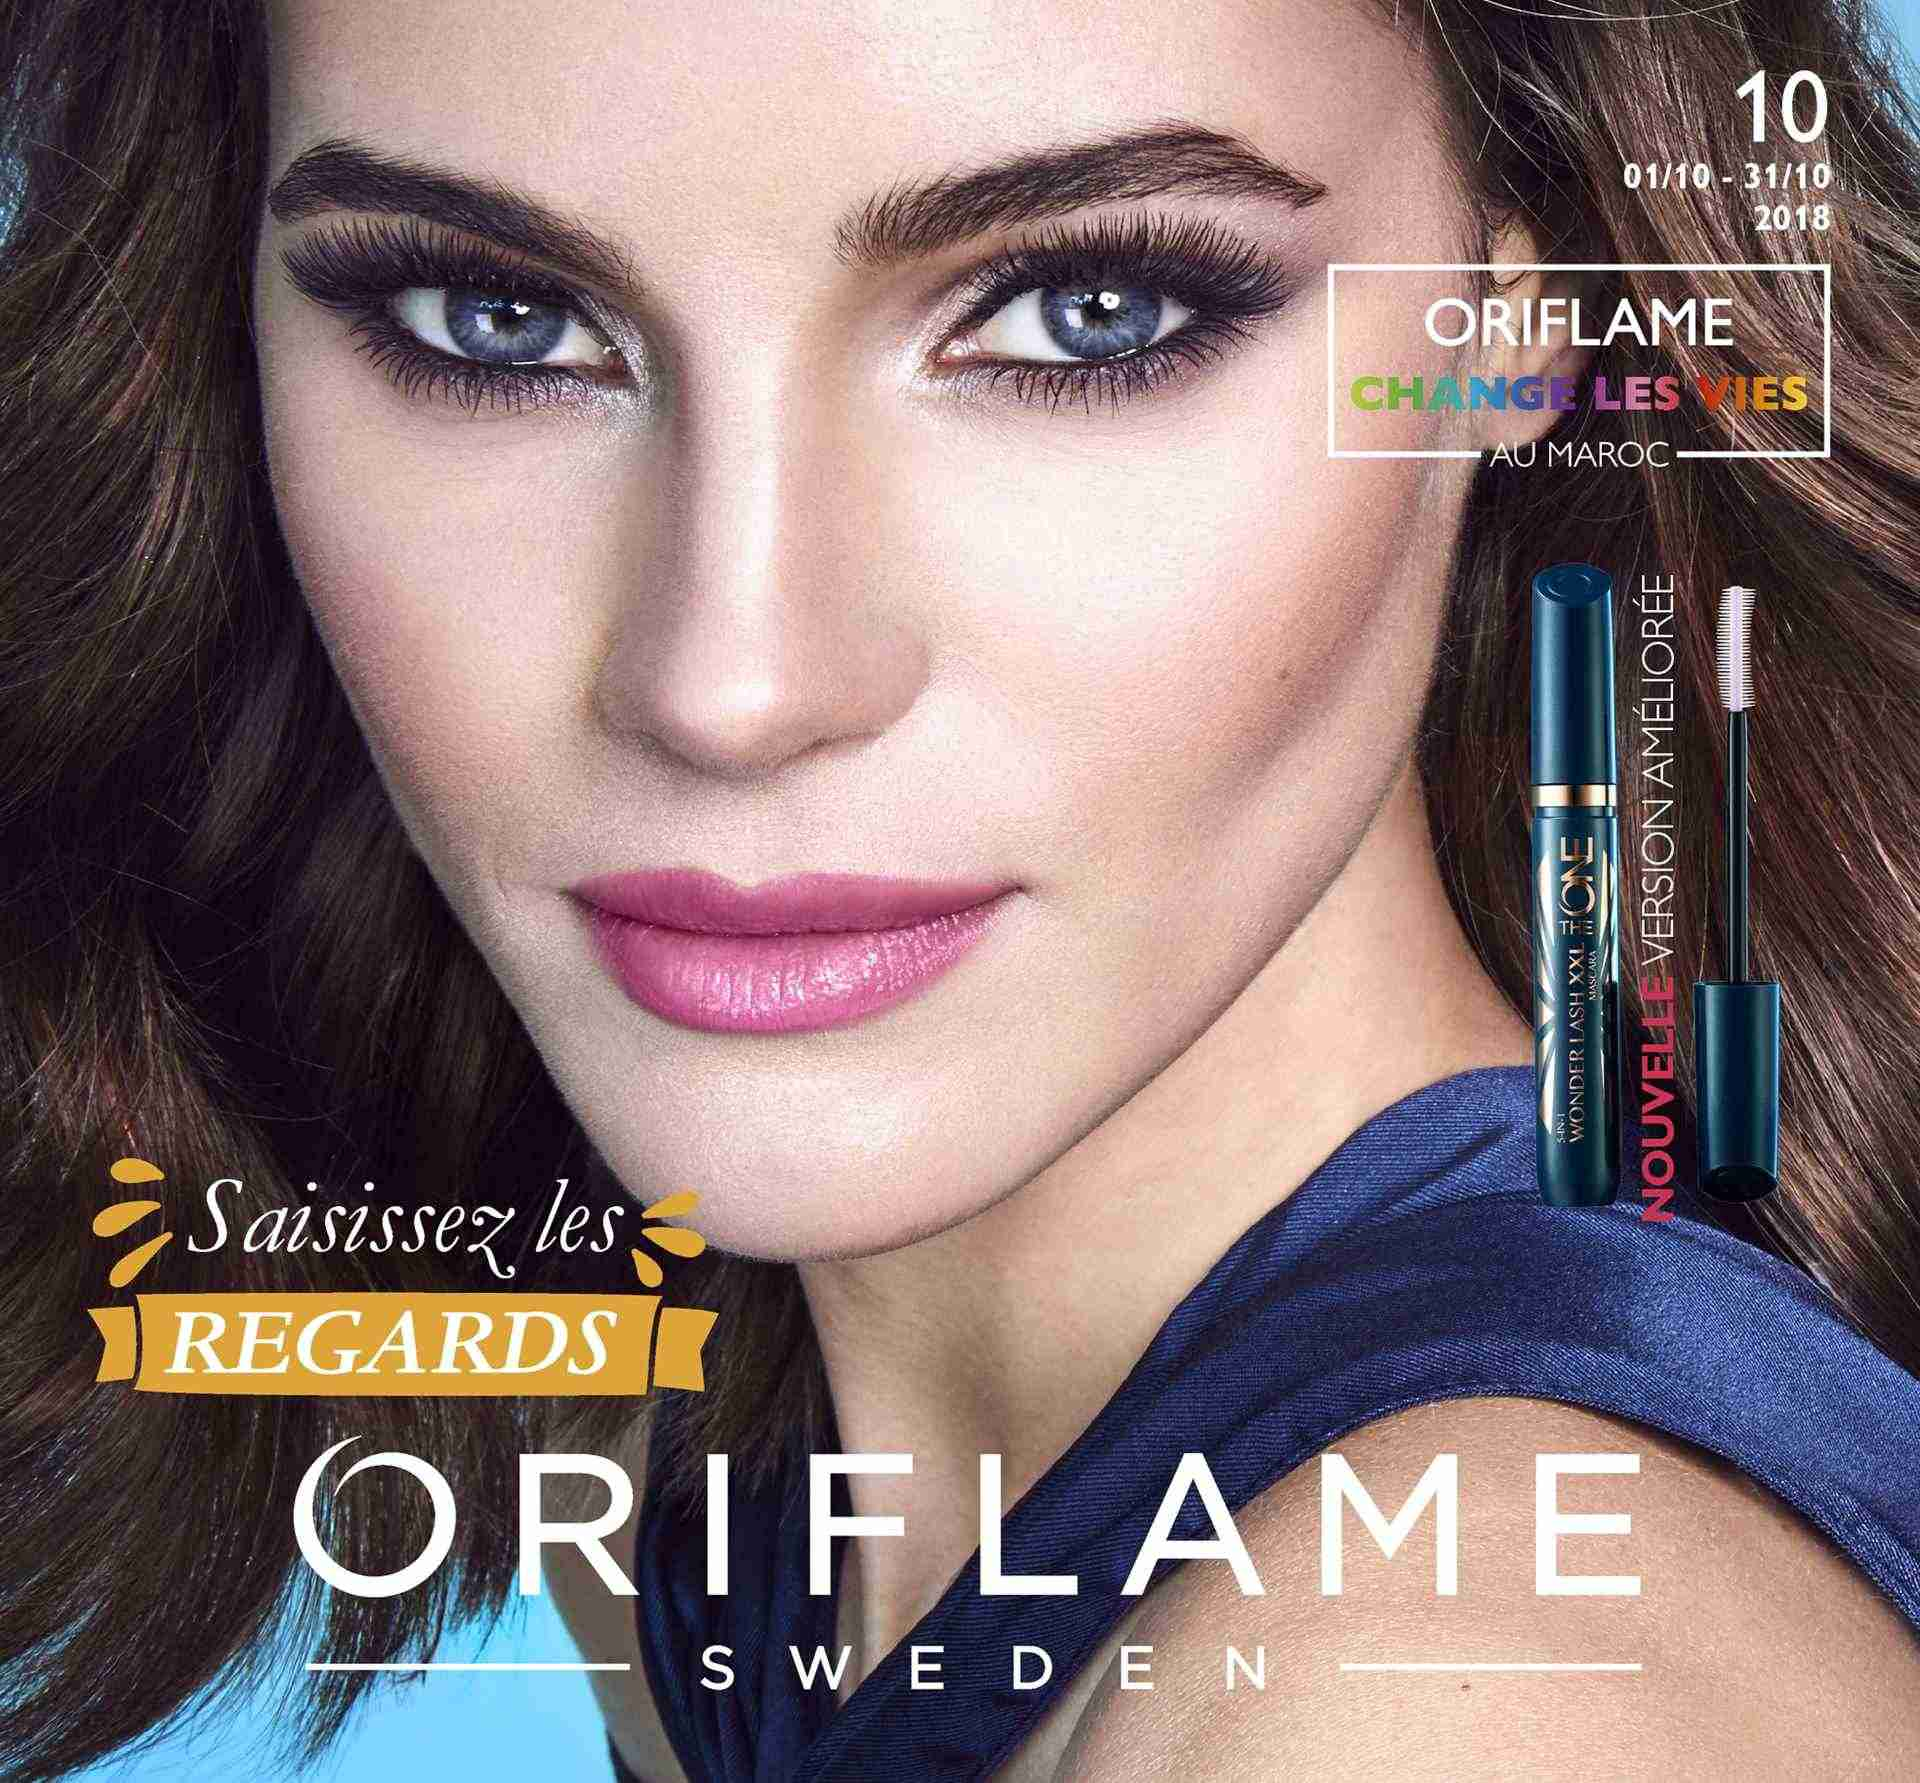 Oriflame (1)